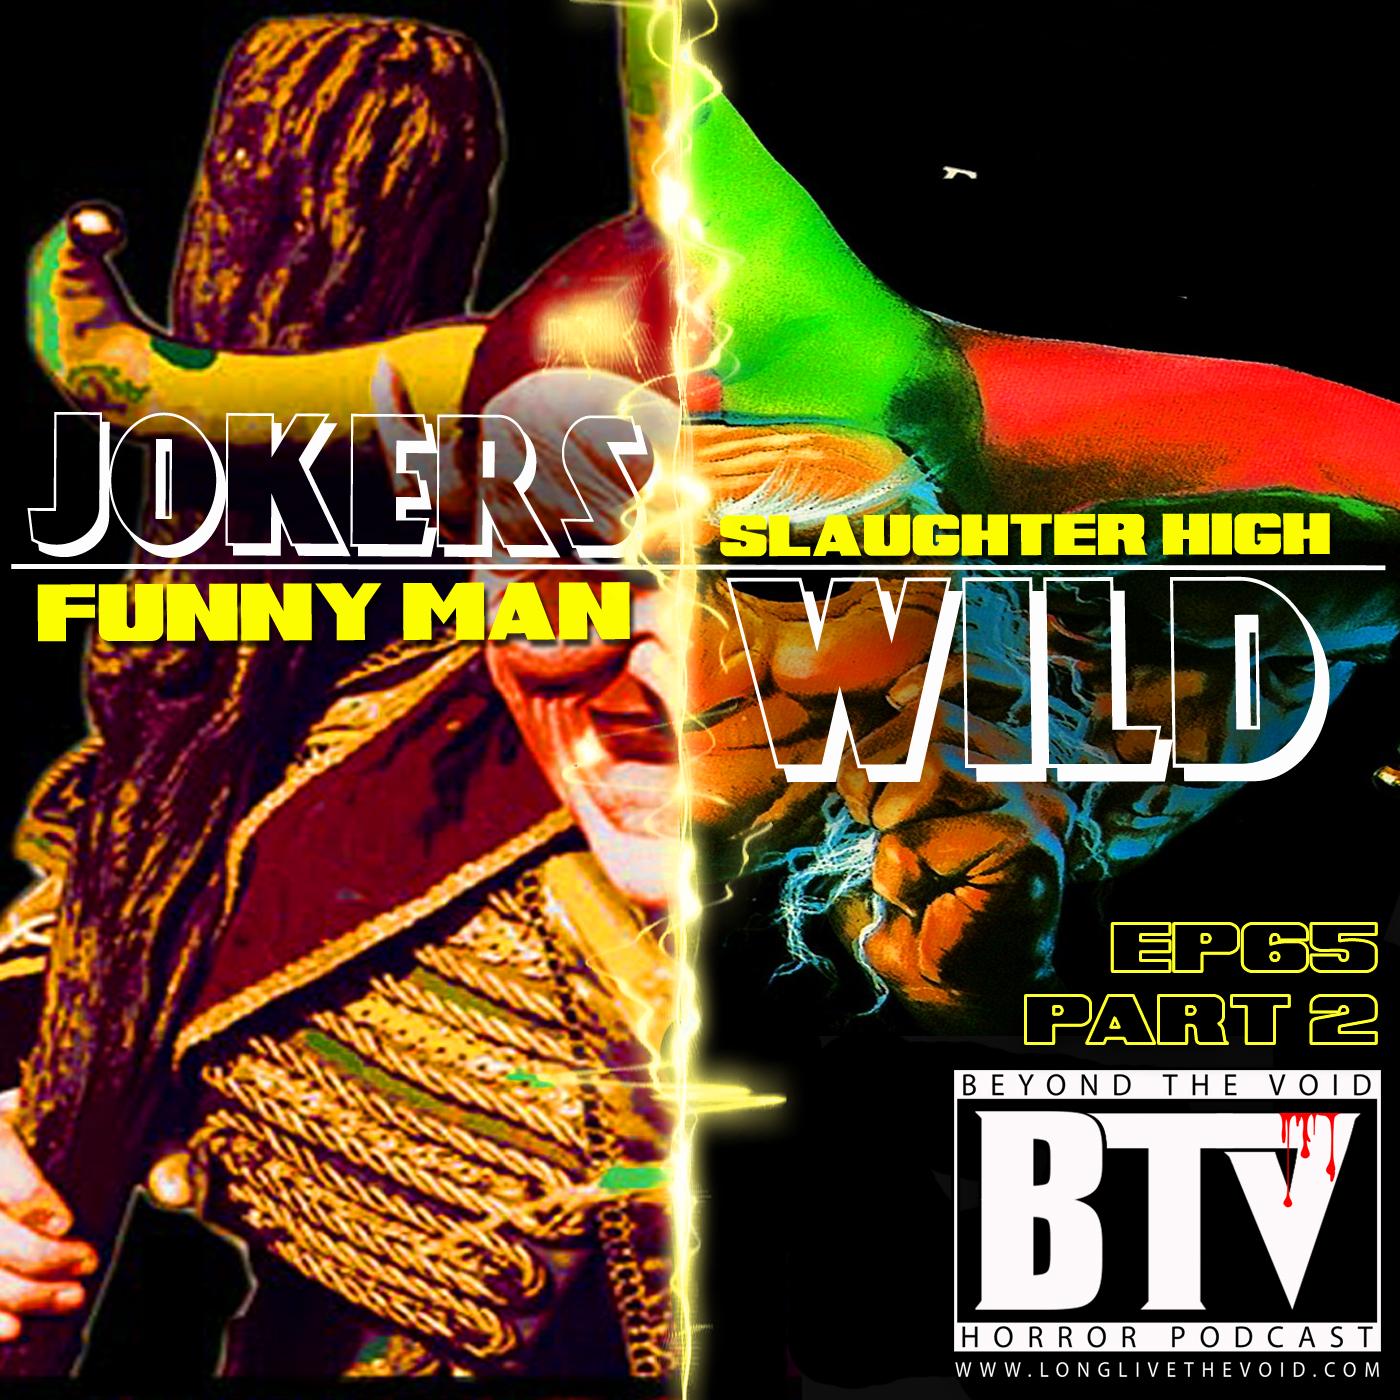 FINALJokers-Wild-14x14cover.jpg